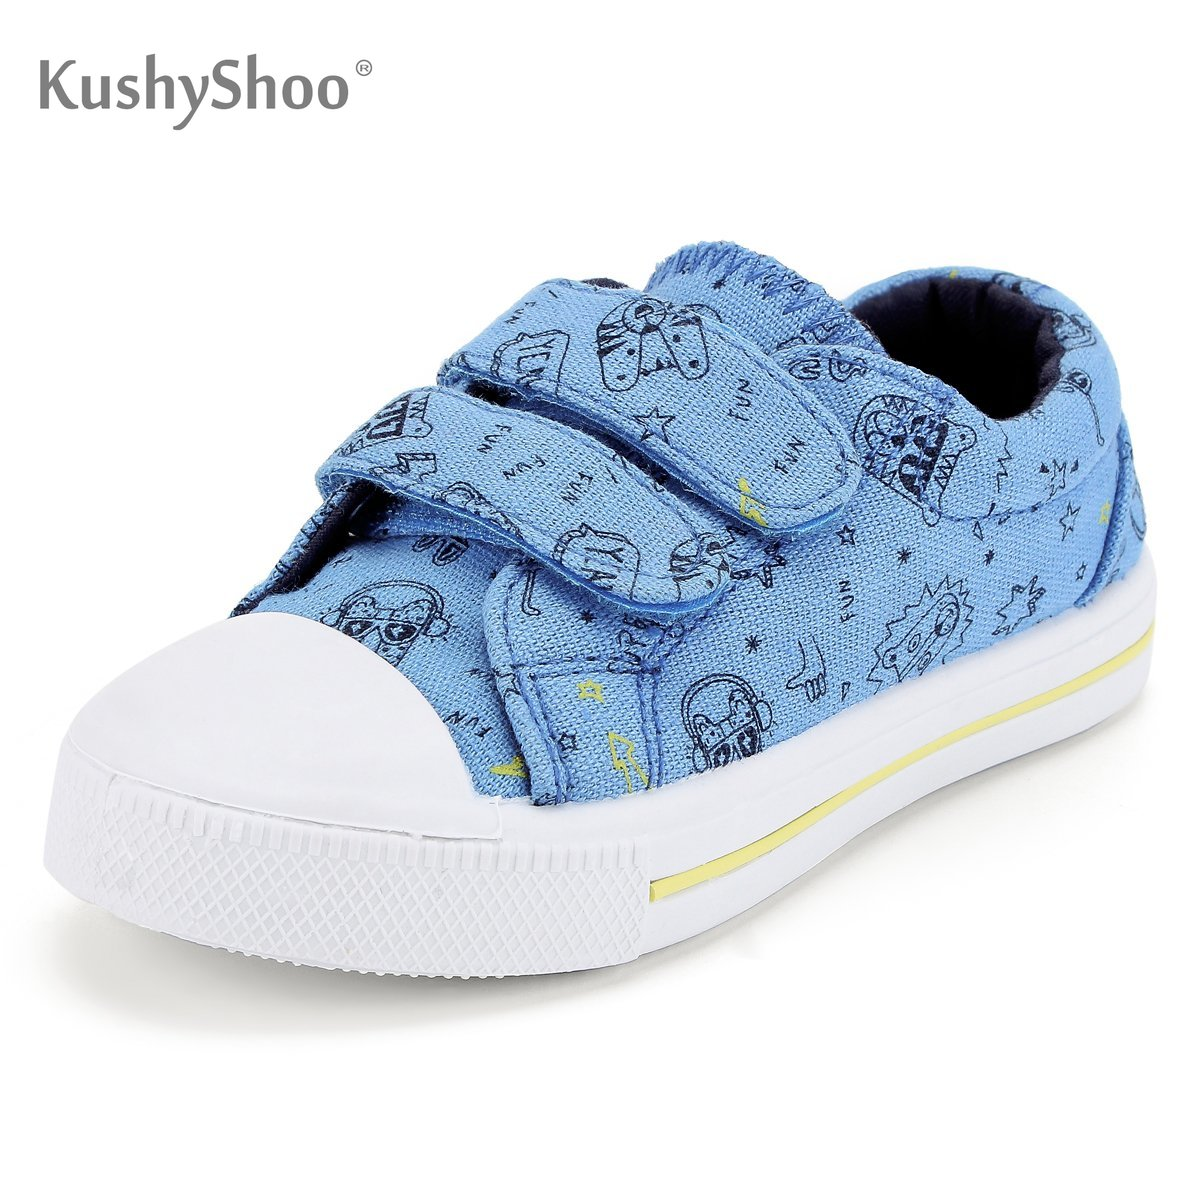 KushyShoo Toddler Sneakers Boys Cartoon Dual Hook And Loops Girls Sneakers Baby Canvas Shoes Children's Sneakers Shoes Kids